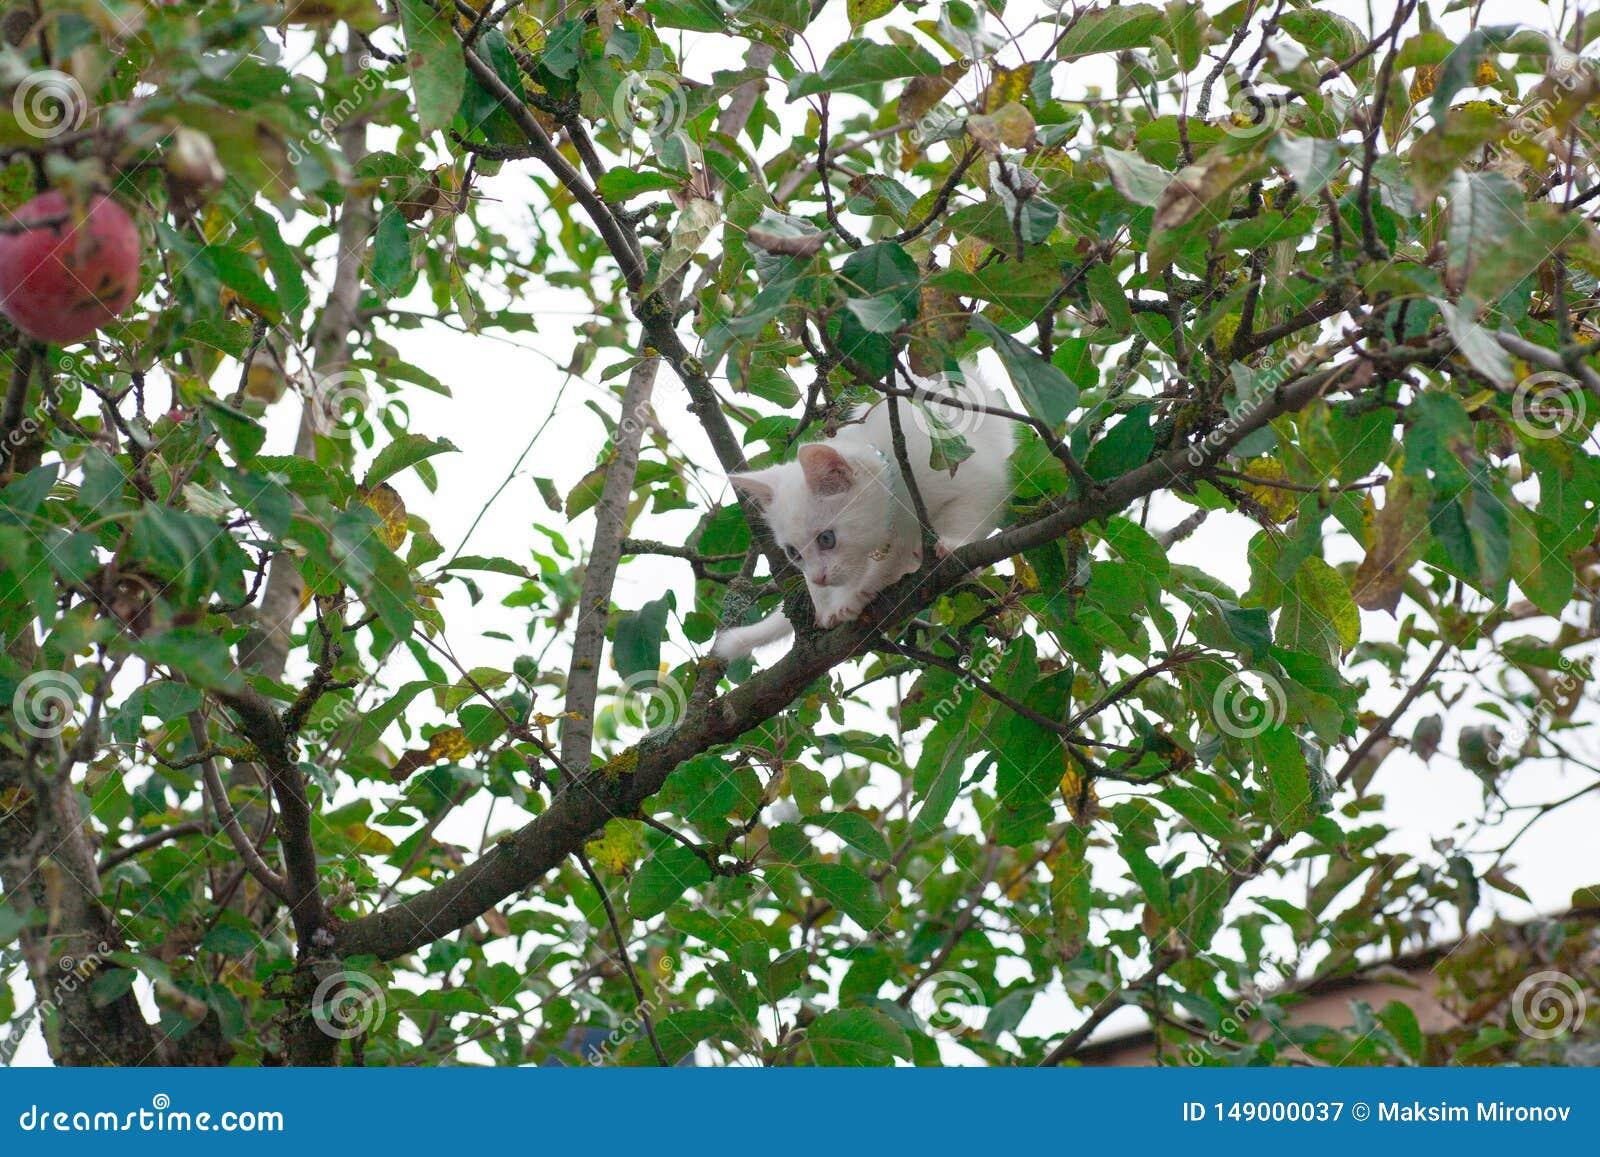 Small cat on tree closeup